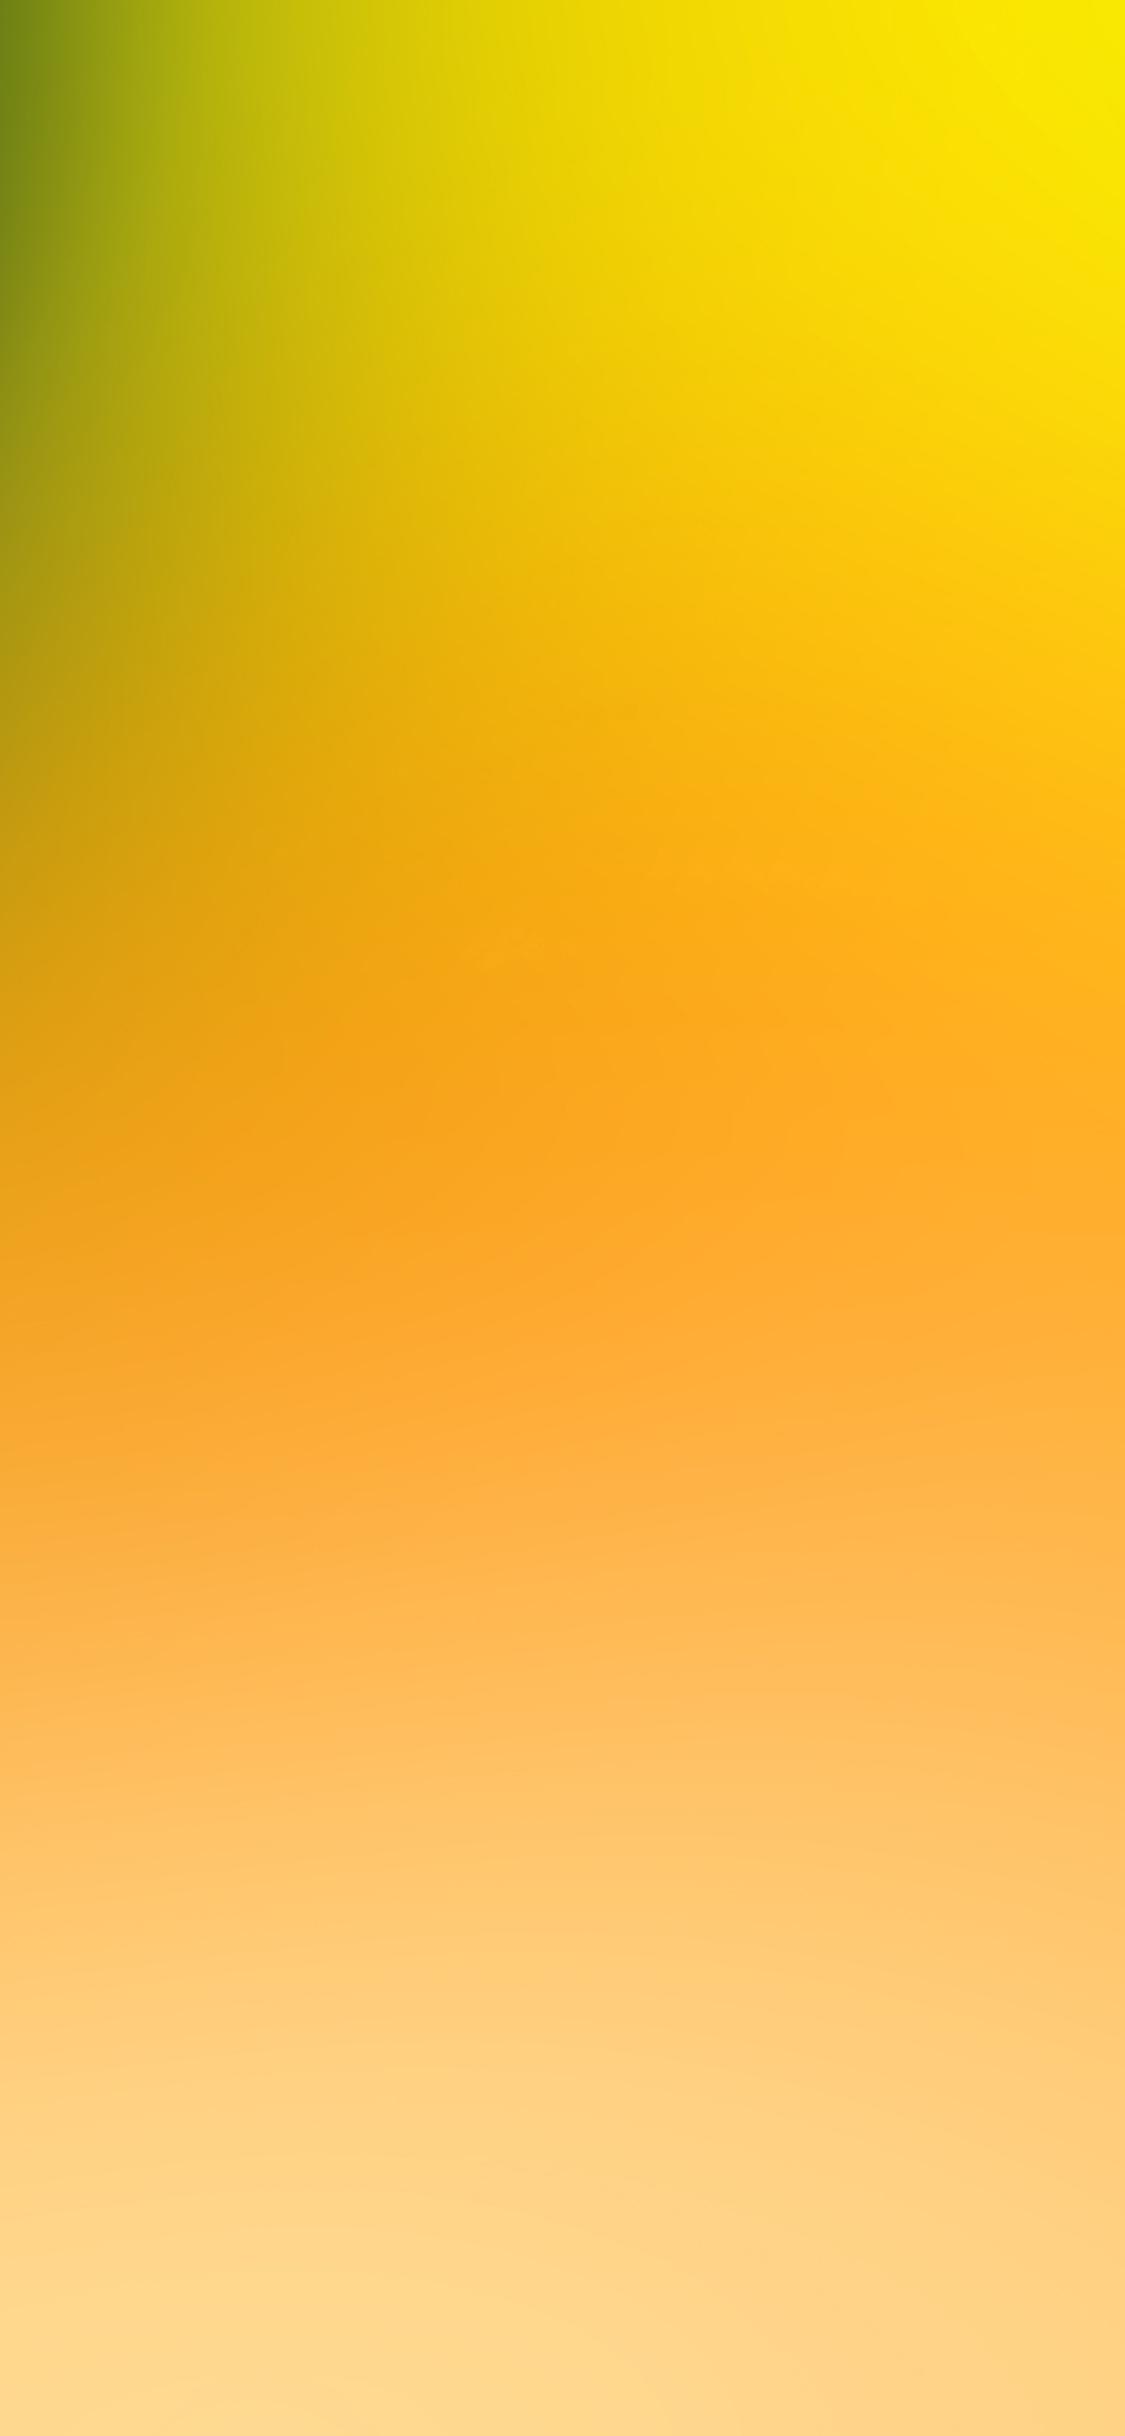 iPhoneXpapers.com-Apple-iPhone-wallpaper-sb02-wallpaper-yellow-banana-blur